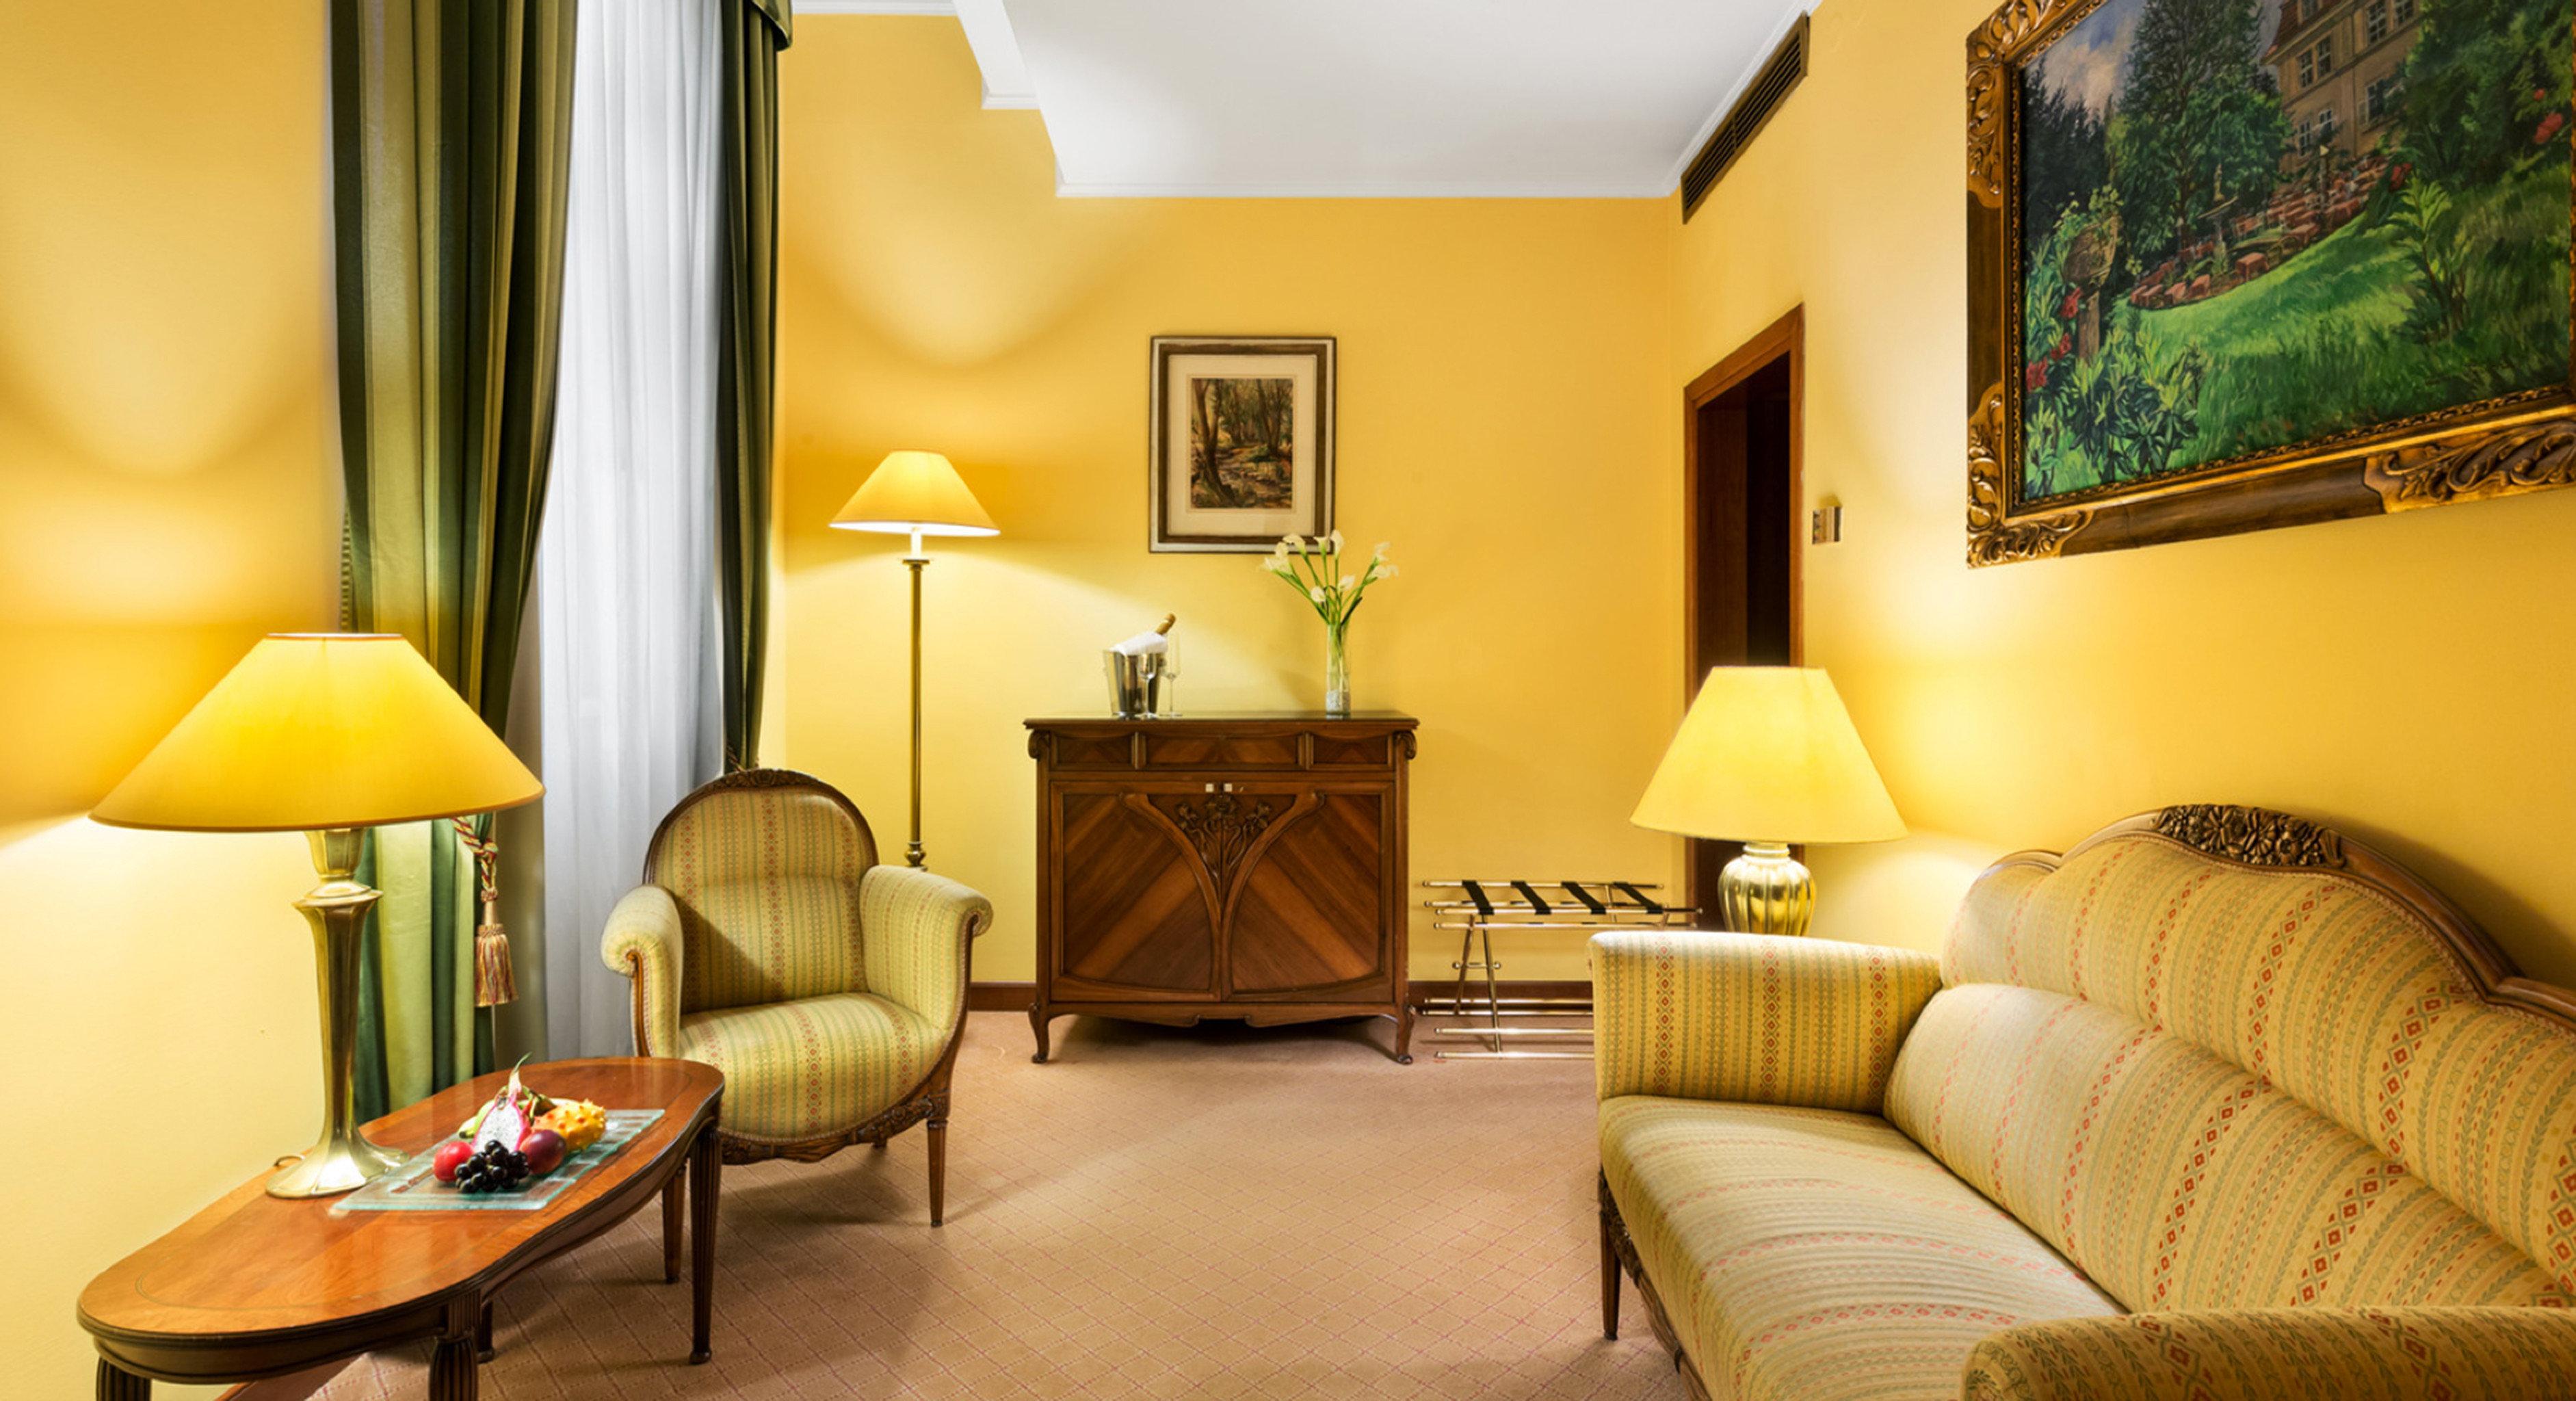 Classic Lounge Luxury sofa property Suite home living room yellow cottage Villa condominium